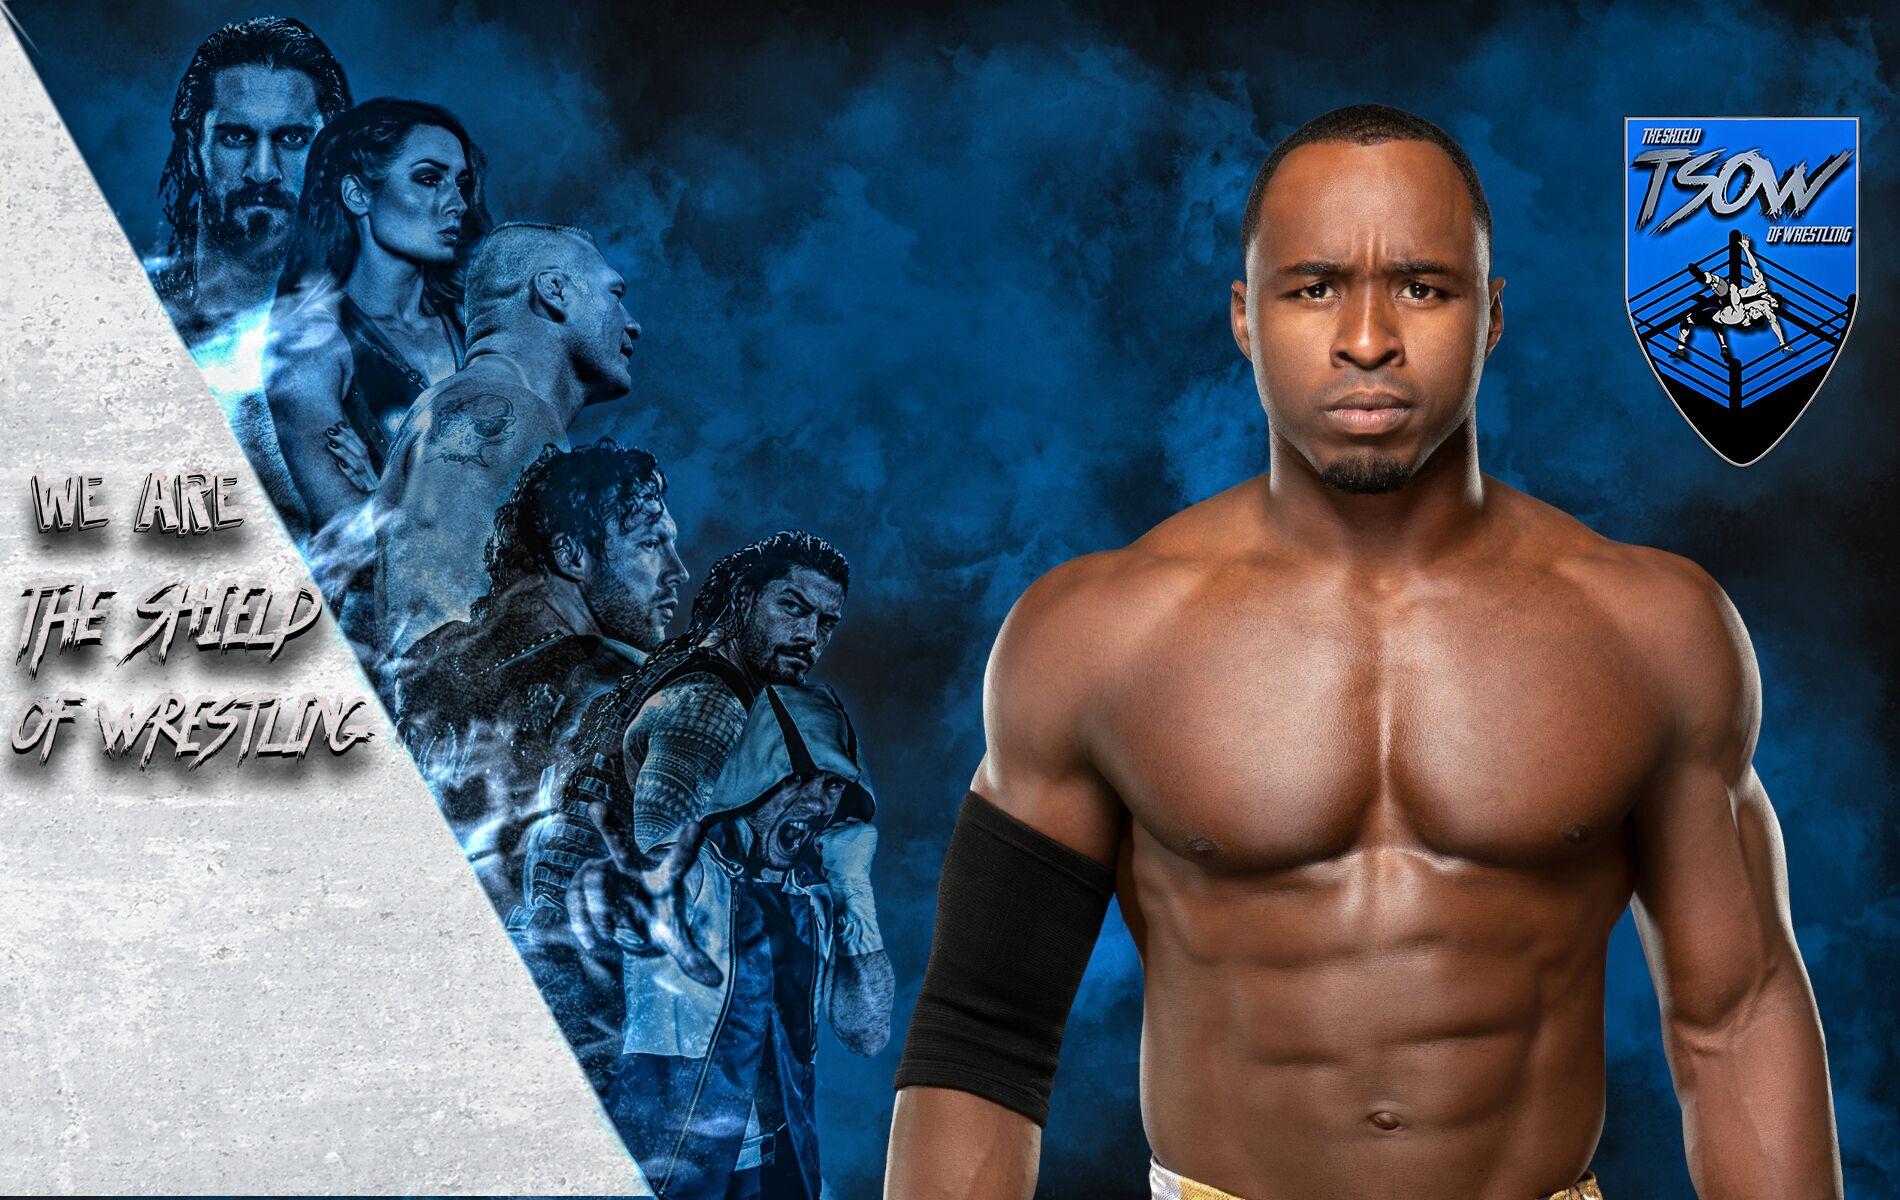 Jordan Myles lascia la WWE